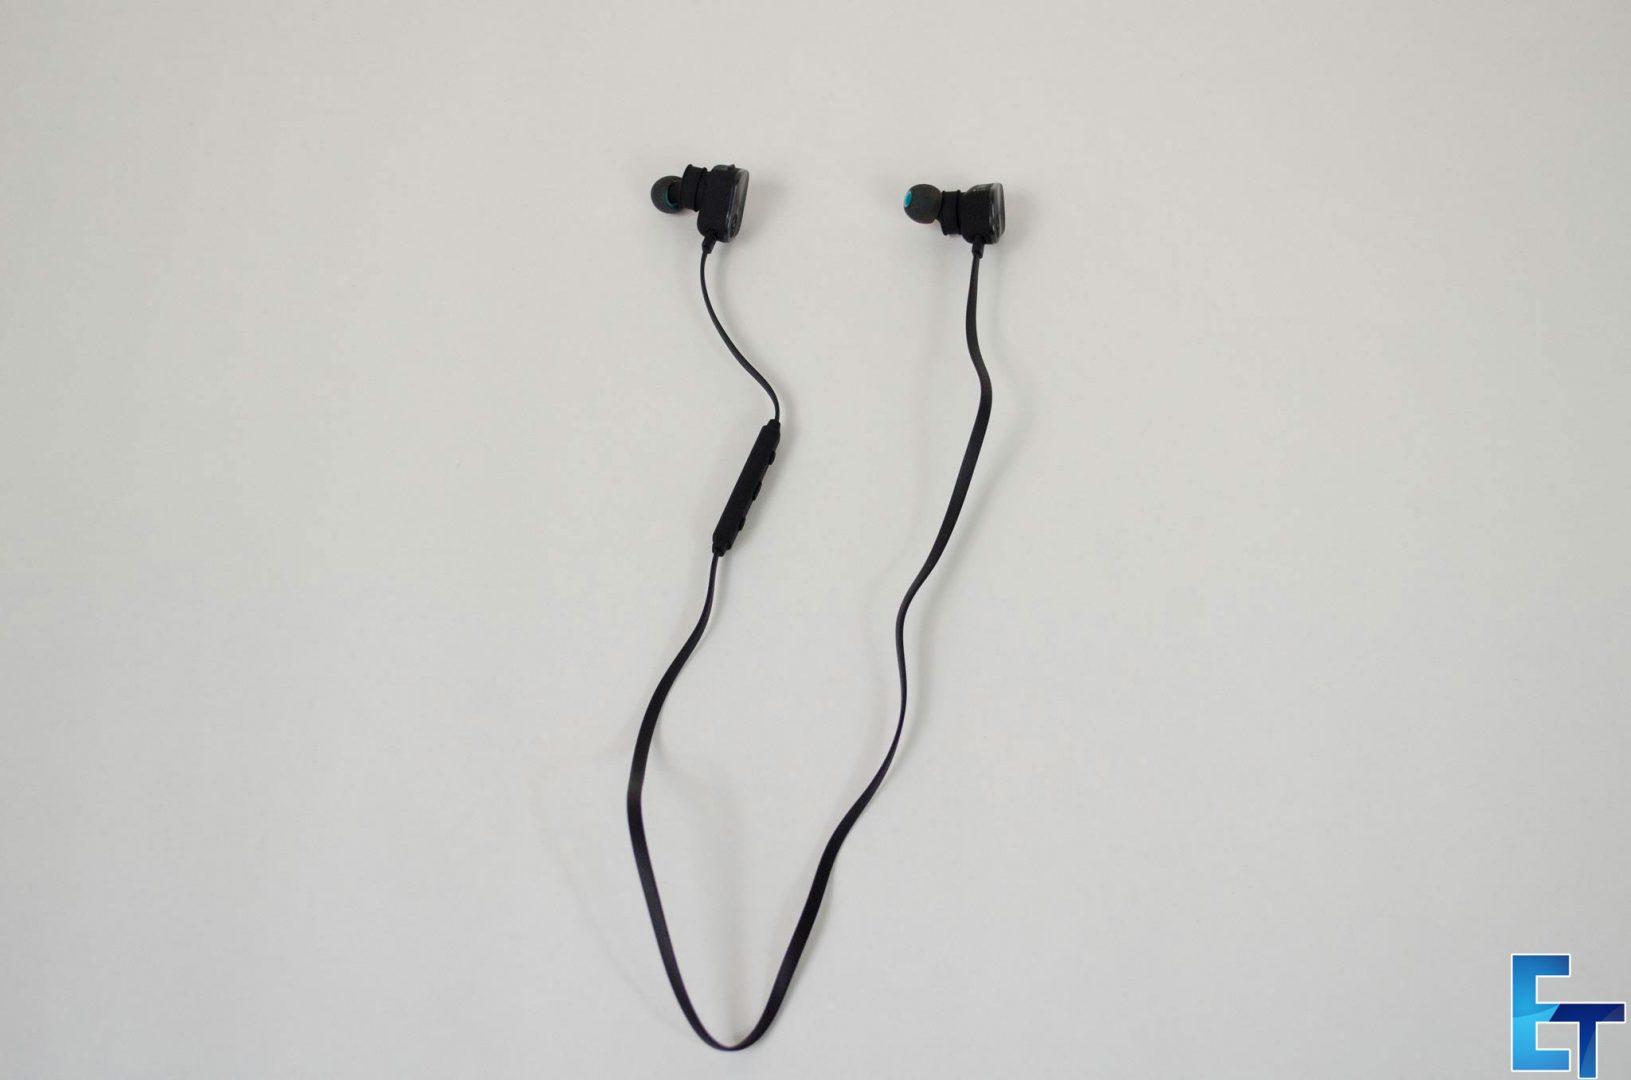 Mpow-Wolverine-Wireless-Bluetooth-4.1-Sport-Headphones_2